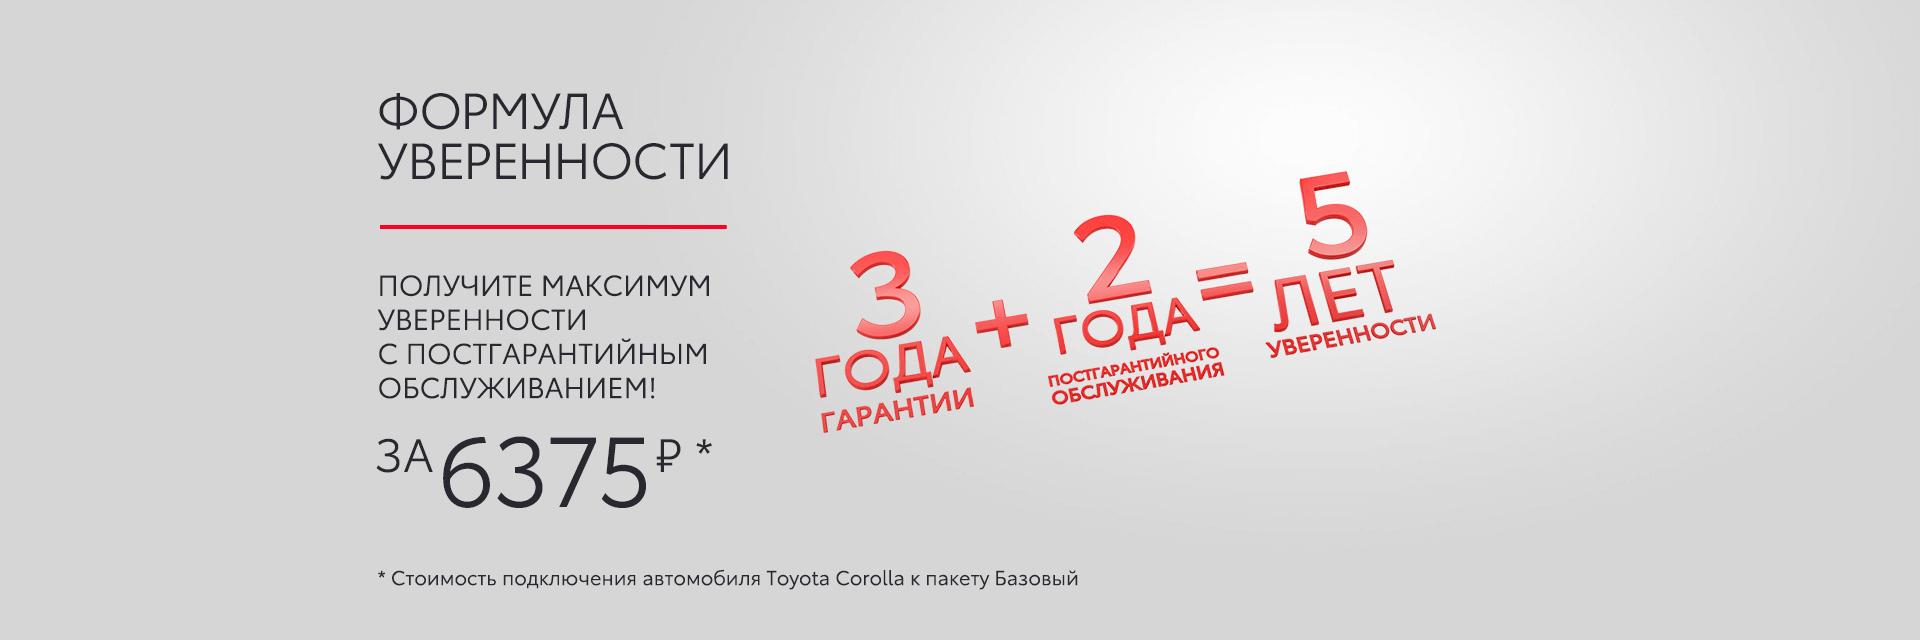 Формула уверенности